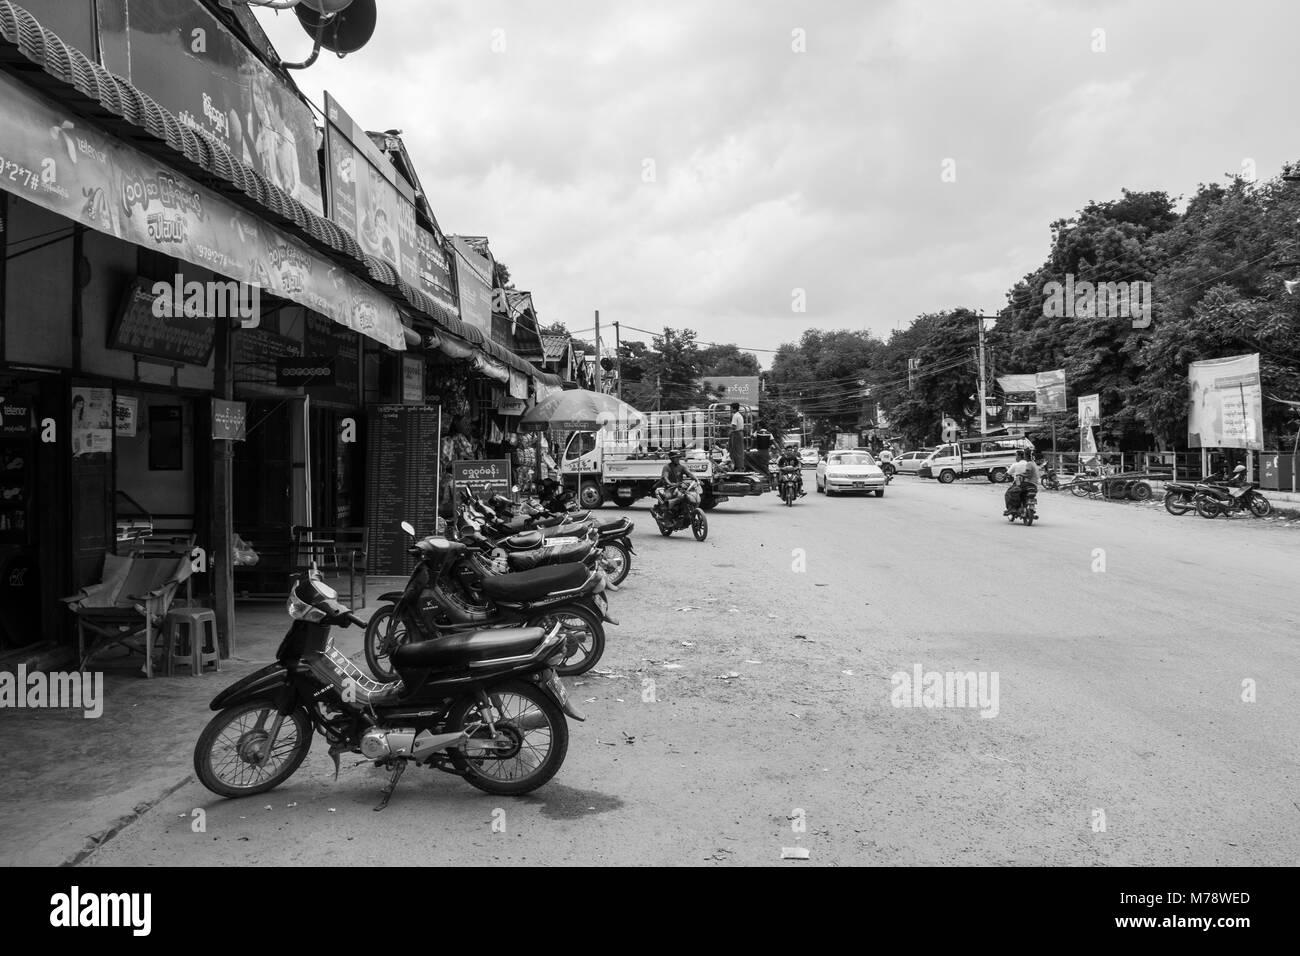 A sandy road next to Nyaung U market near Bagan, Myanmar, Burma. market stalls and parked motorcycles, common mode - Stock Image